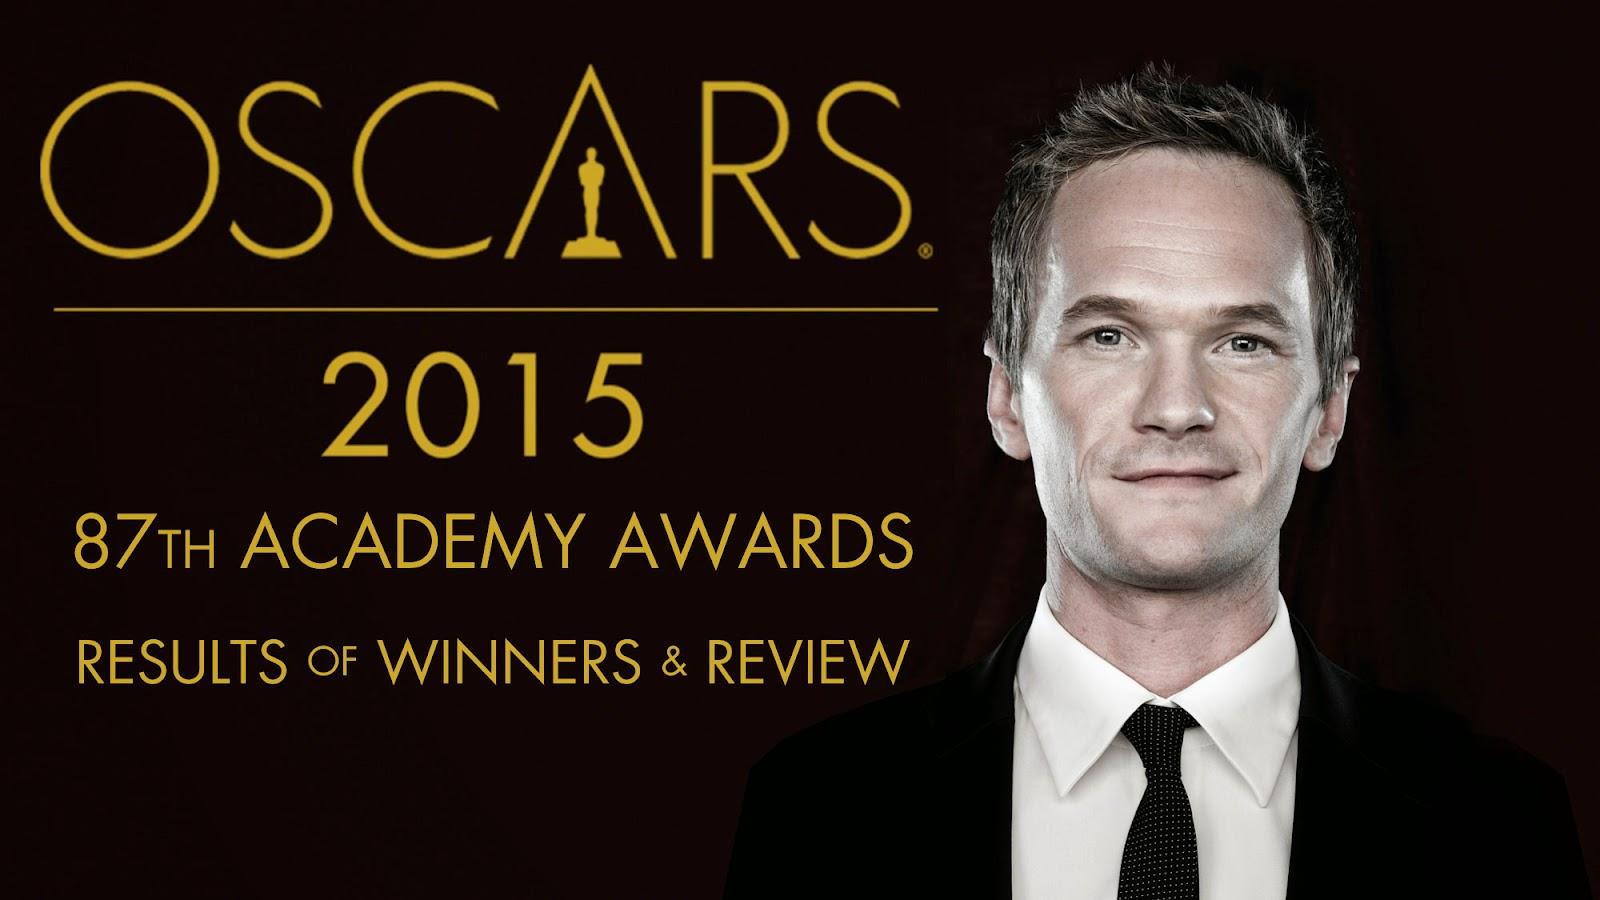 85th Academy Awards - Wikipedia